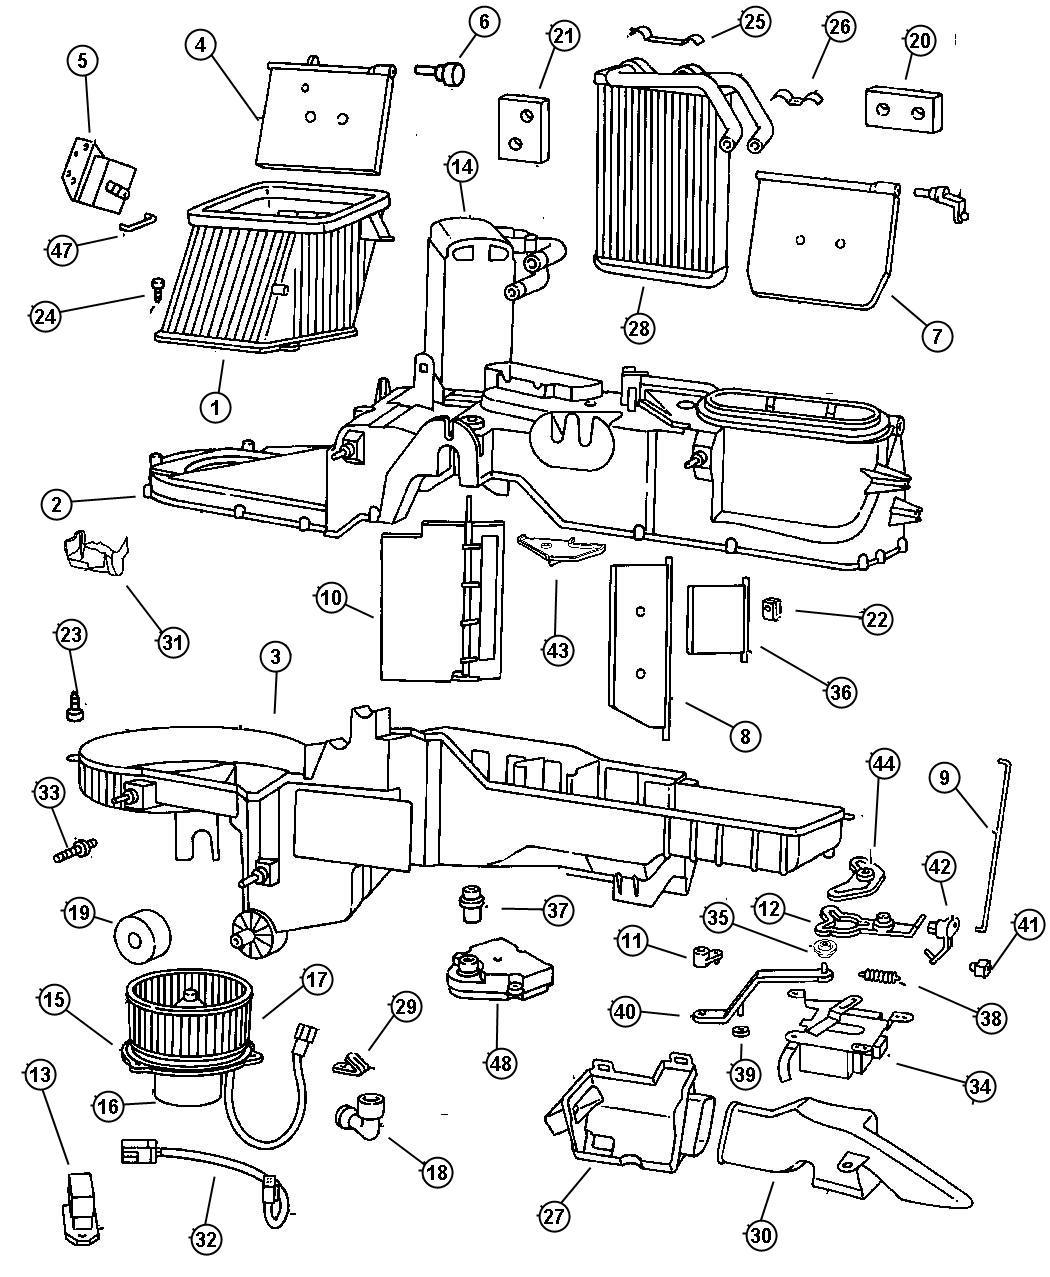 Dodge Ram 3500 Retainer. Wiring harness. Hca, ter, dhc